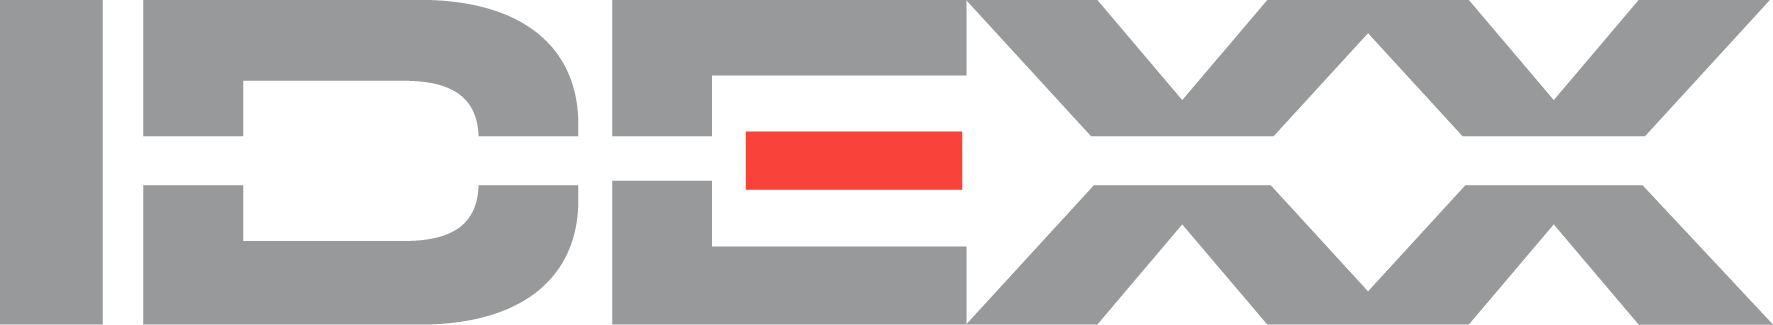 IDEXX Logo RGB SEP2015 2